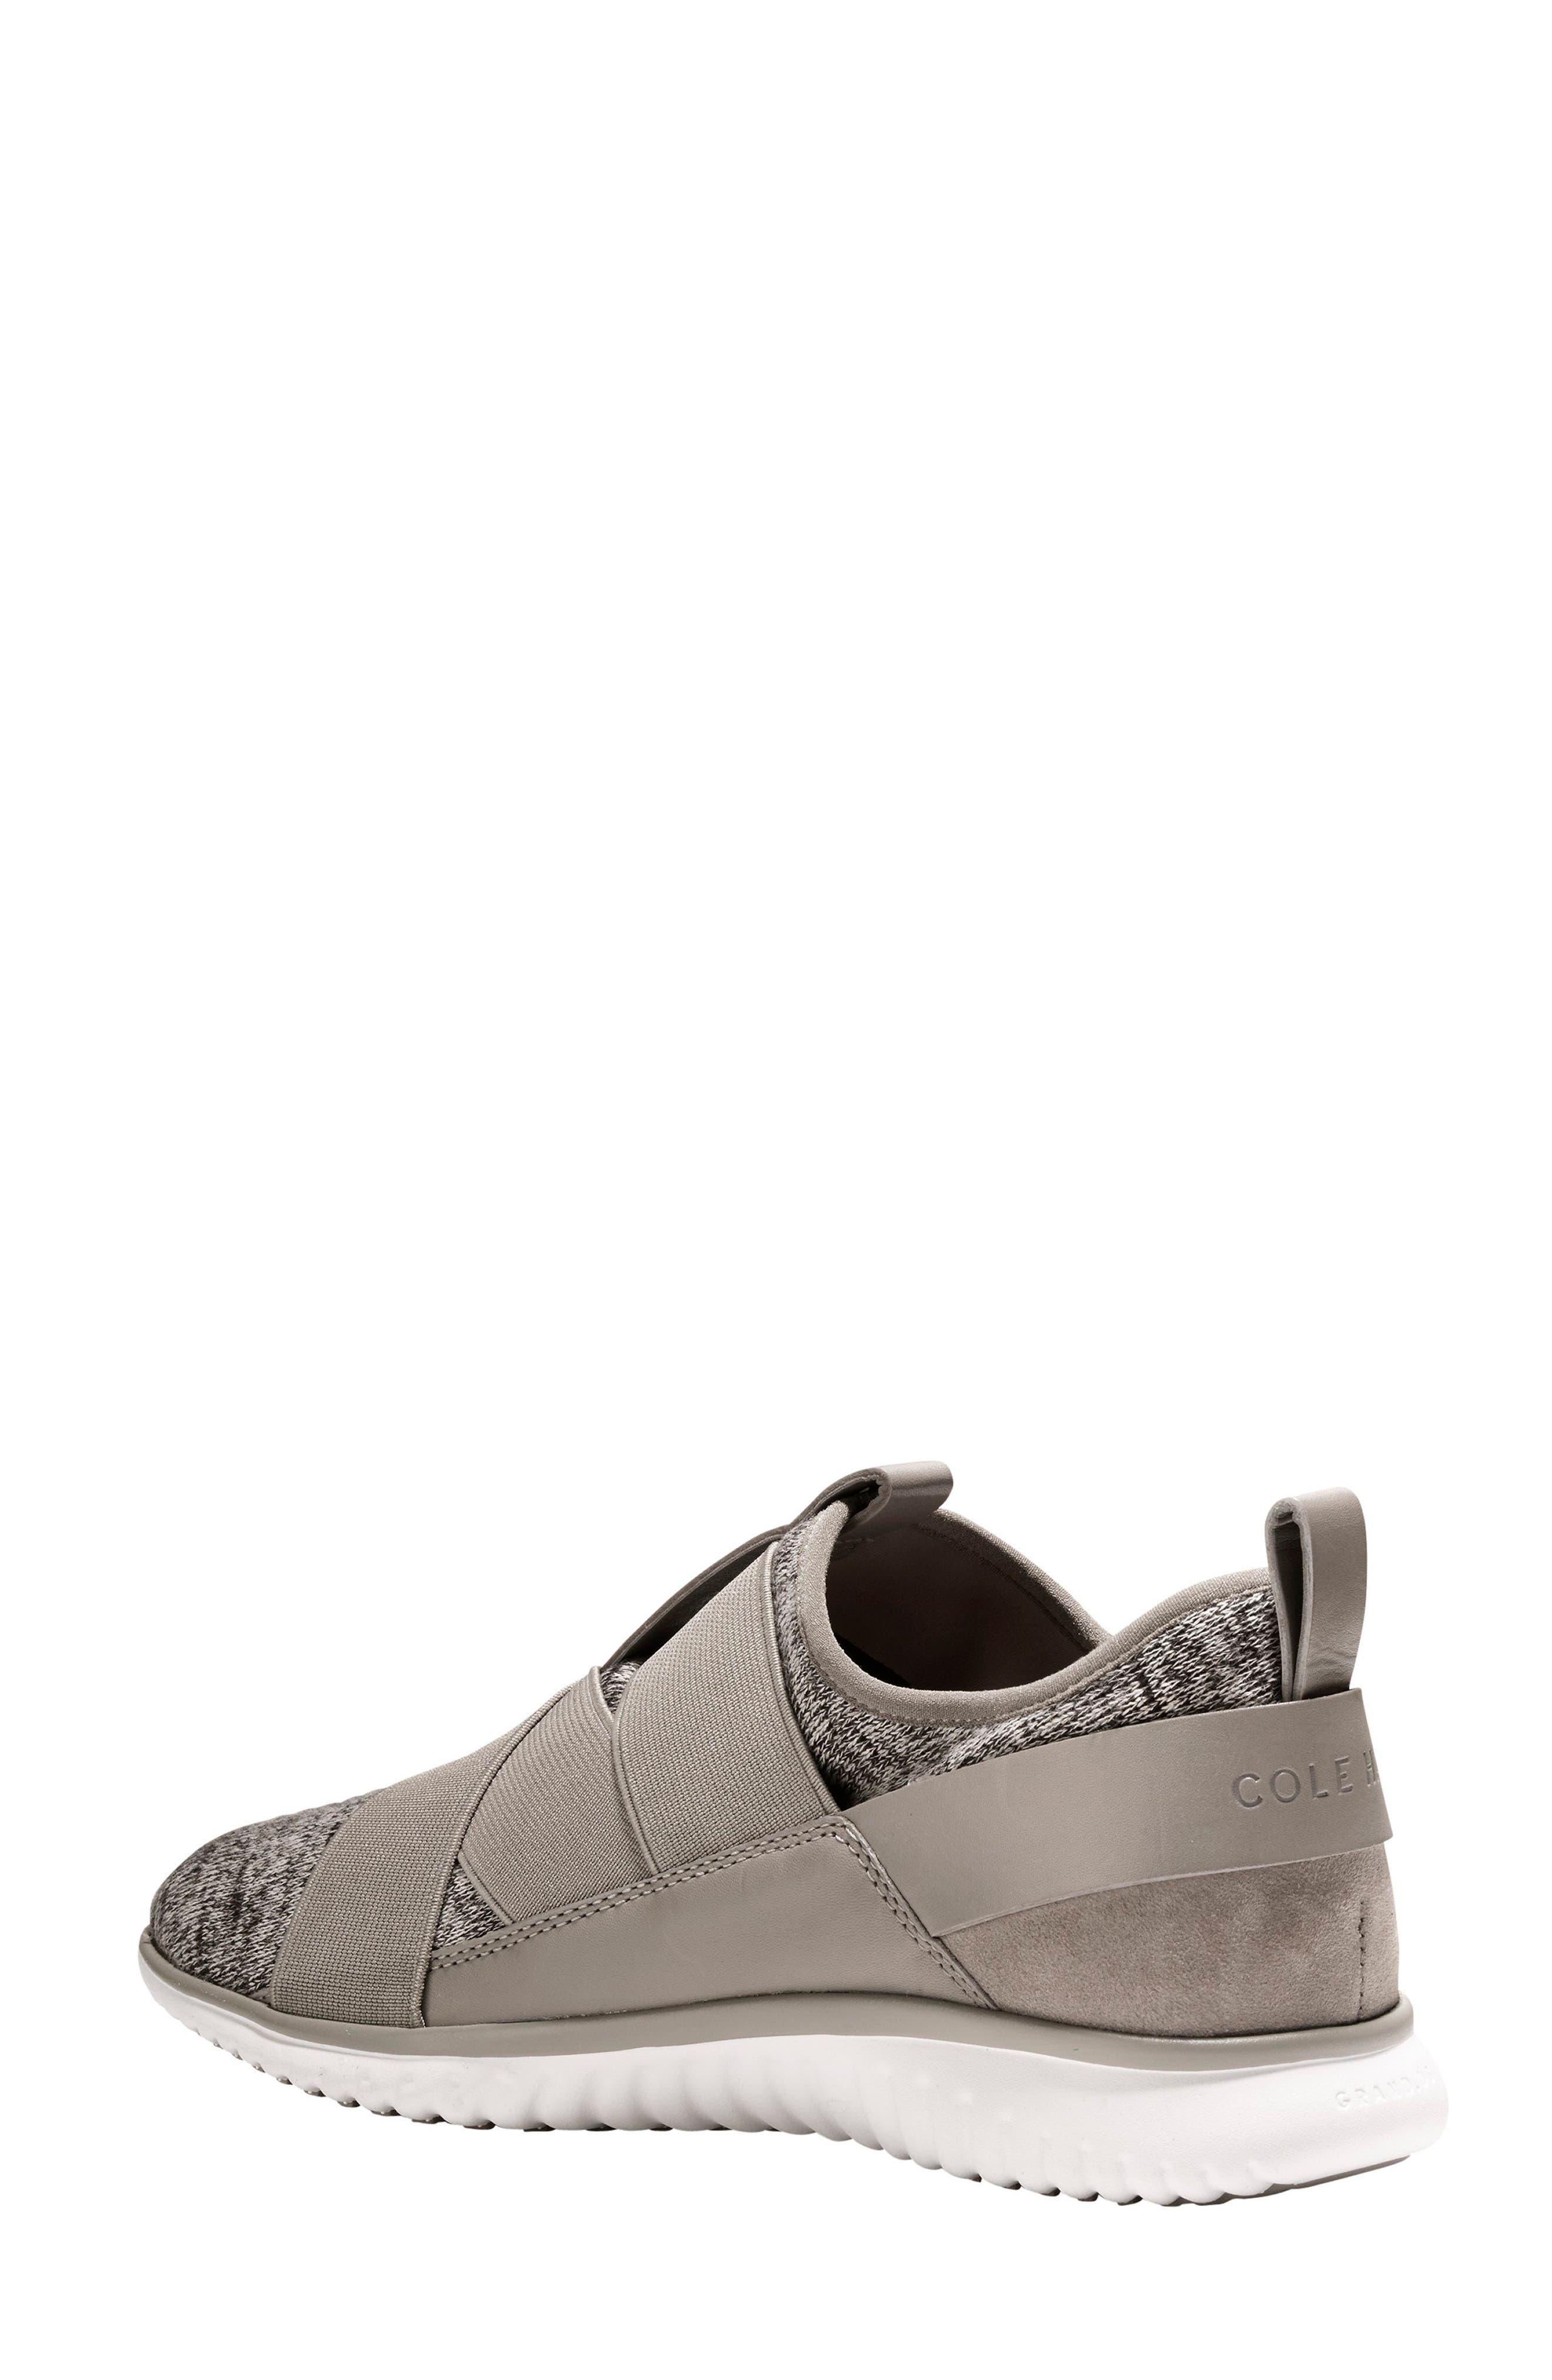 'StudioGrand' Sneaker,                             Alternate thumbnail 10, color,